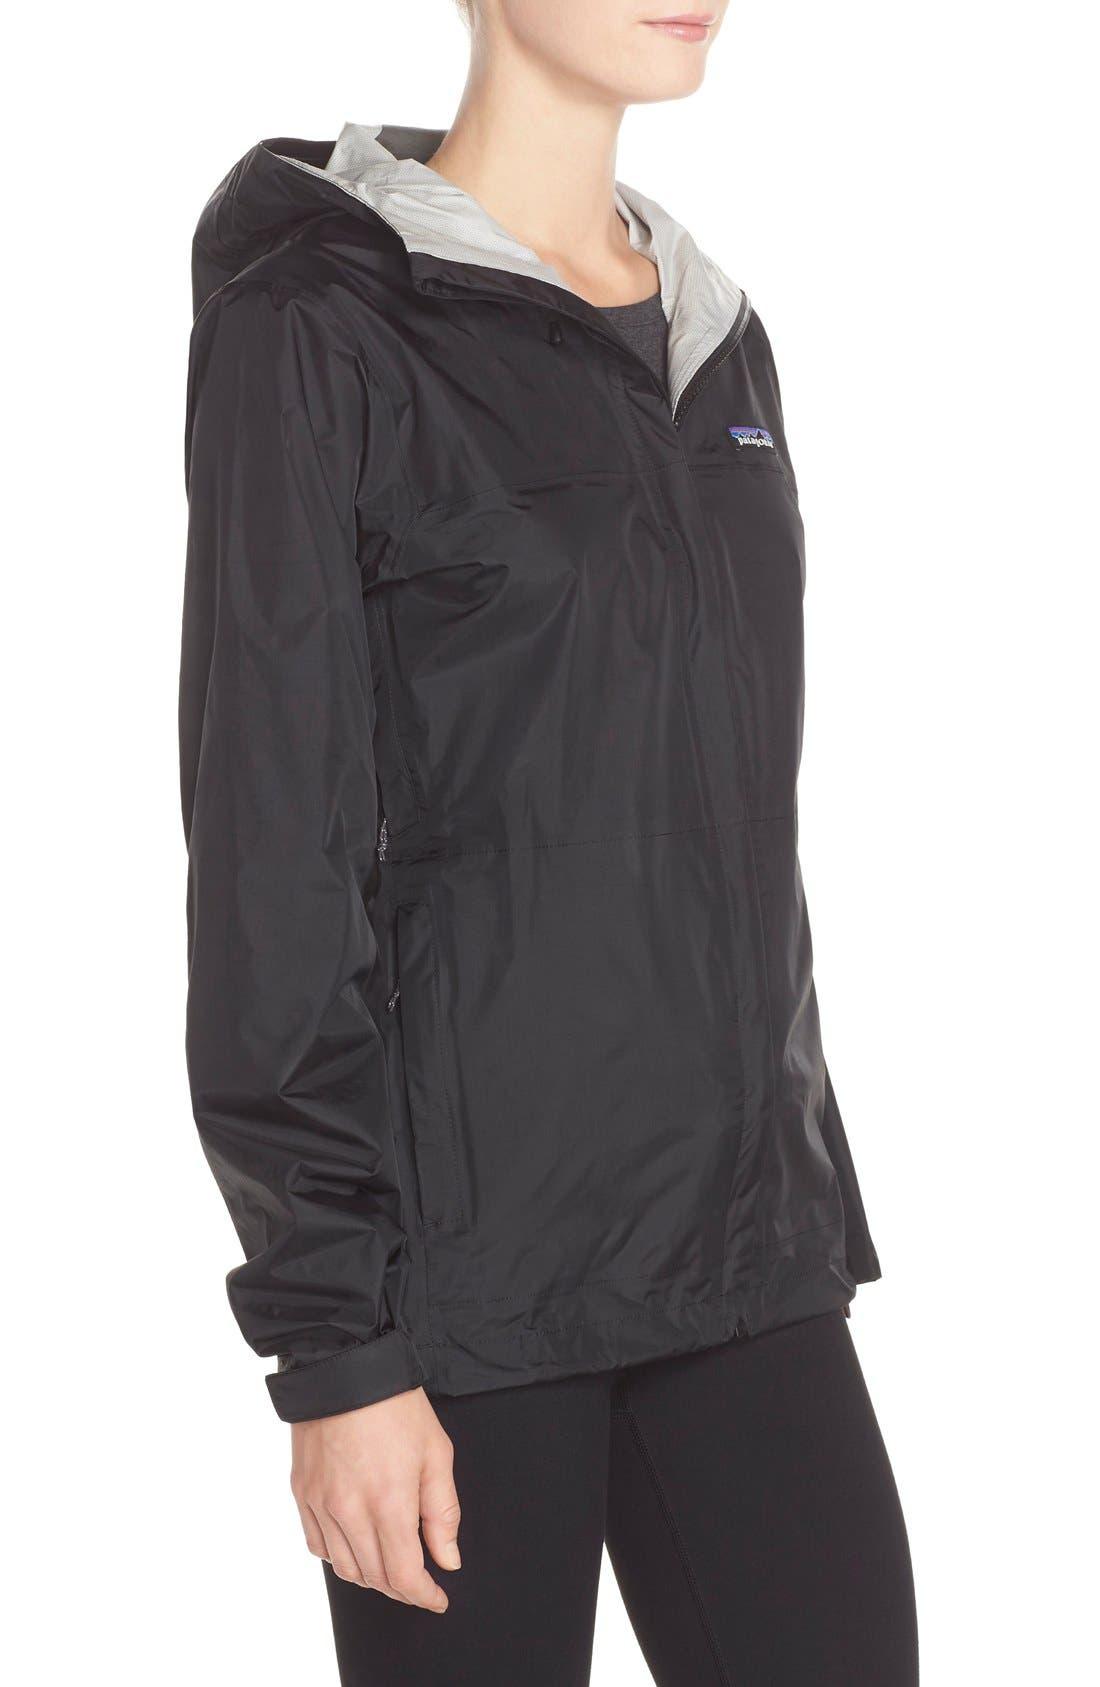 PATAGONIA, Torrentshell Jacket, Alternate thumbnail 5, color, BLACK